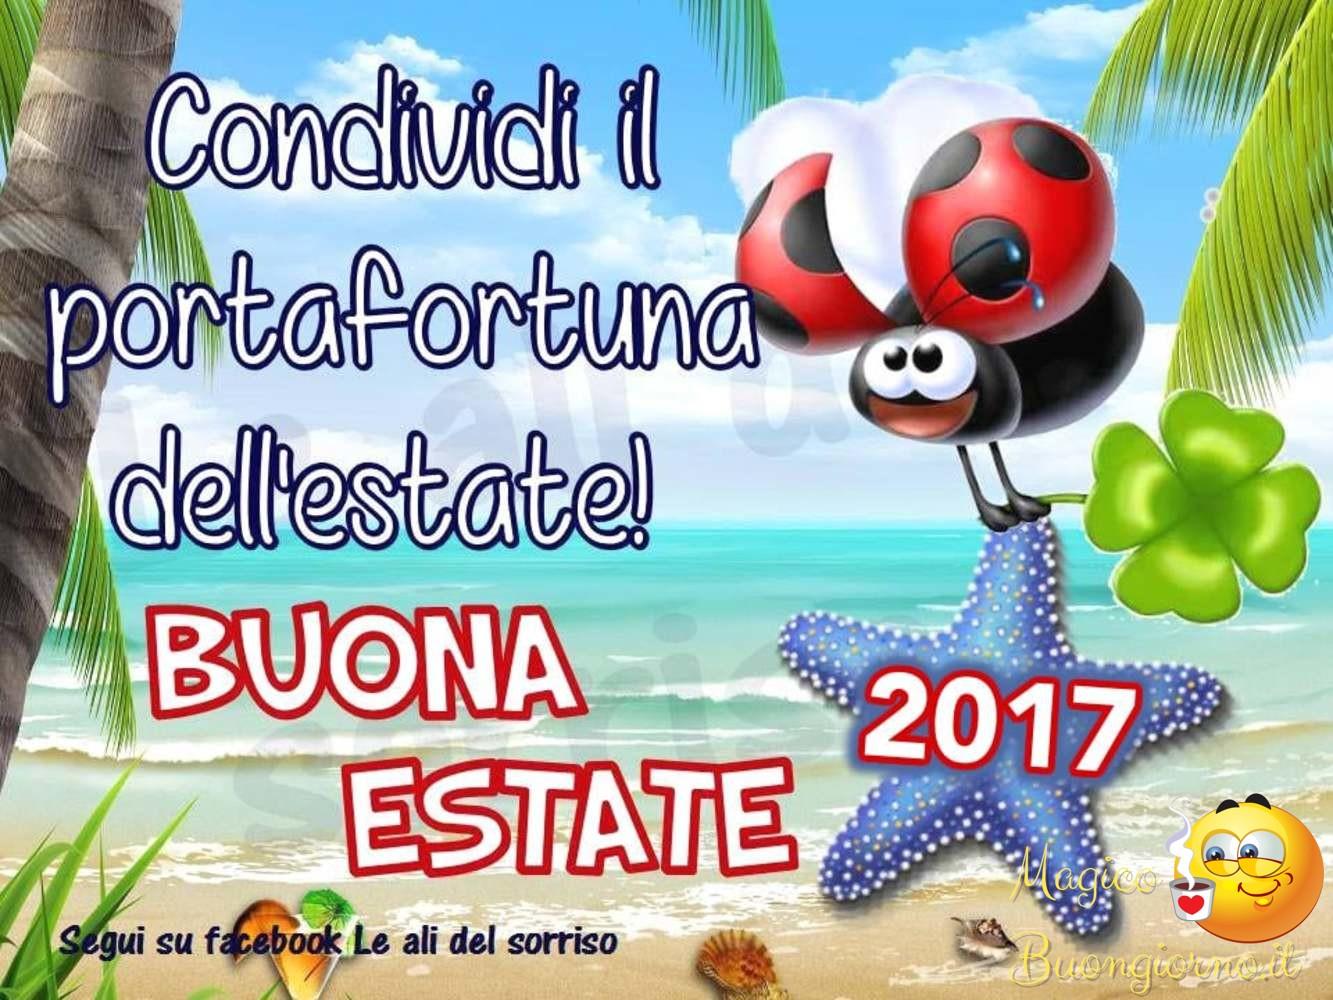 Benvenuta Estate Immagini Facebook Whatsapp 7